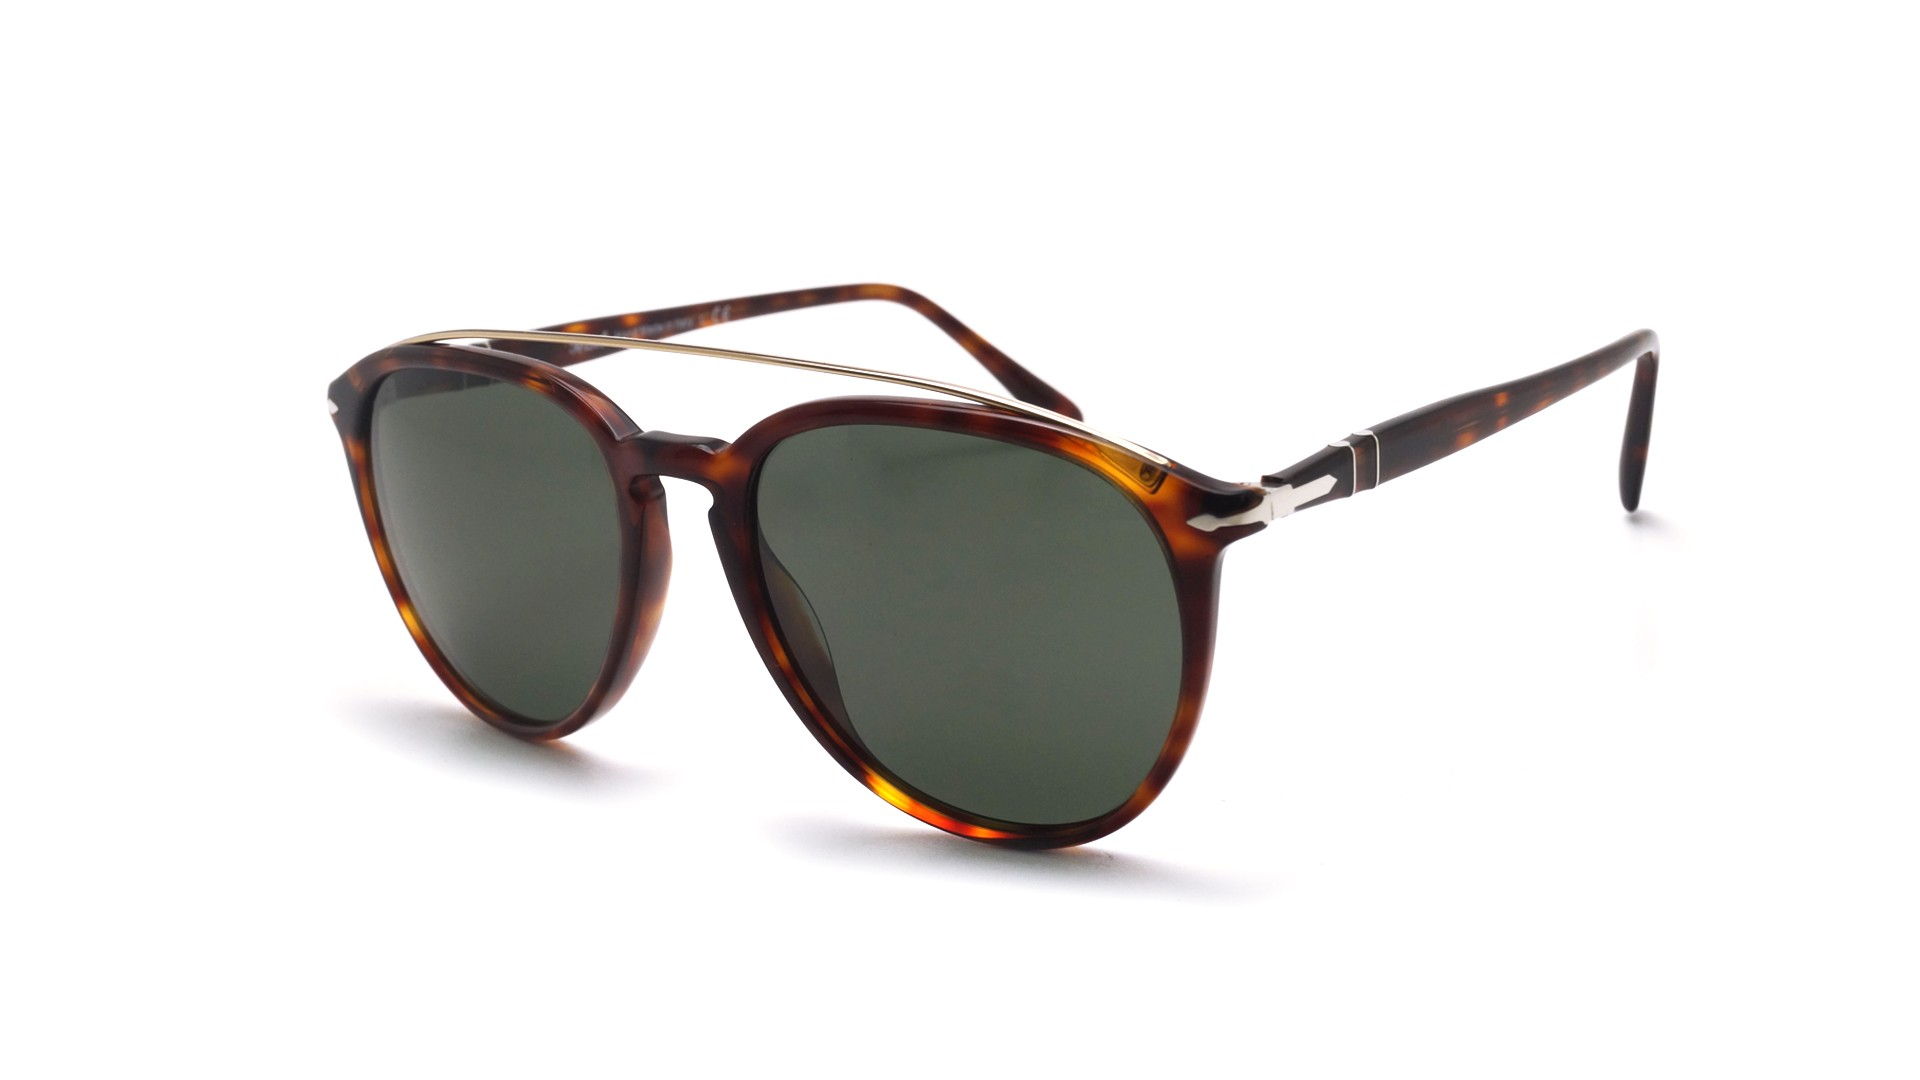 d2a1277b6529c Sunglasses Persol PO3159S 901531 55-19 Havana Tortoise Large